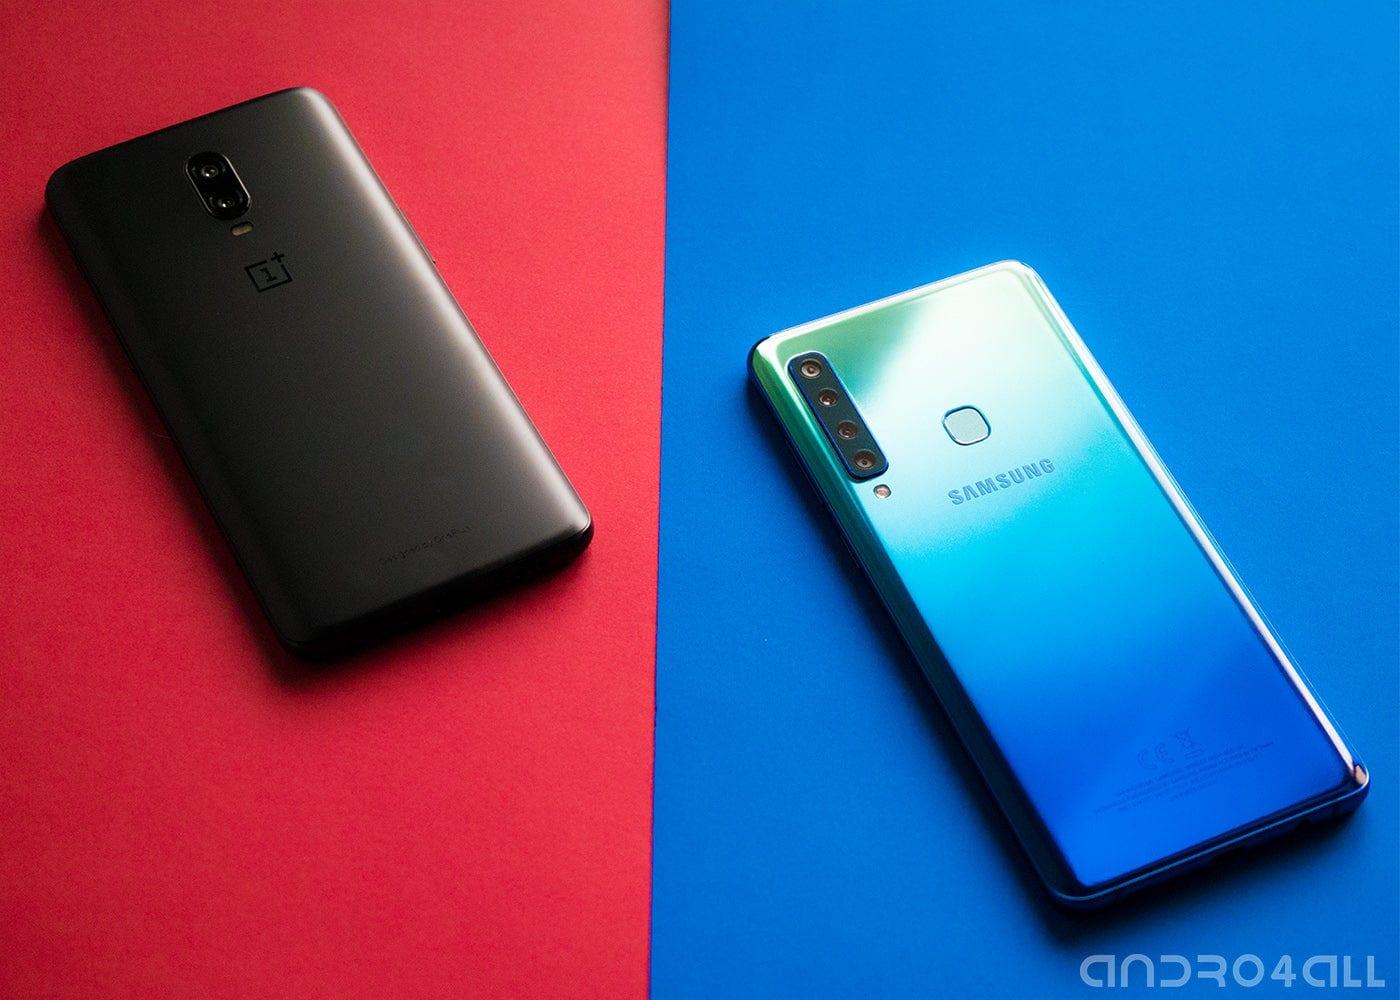 Comparativas de móviles: OnePlus vs Samsung